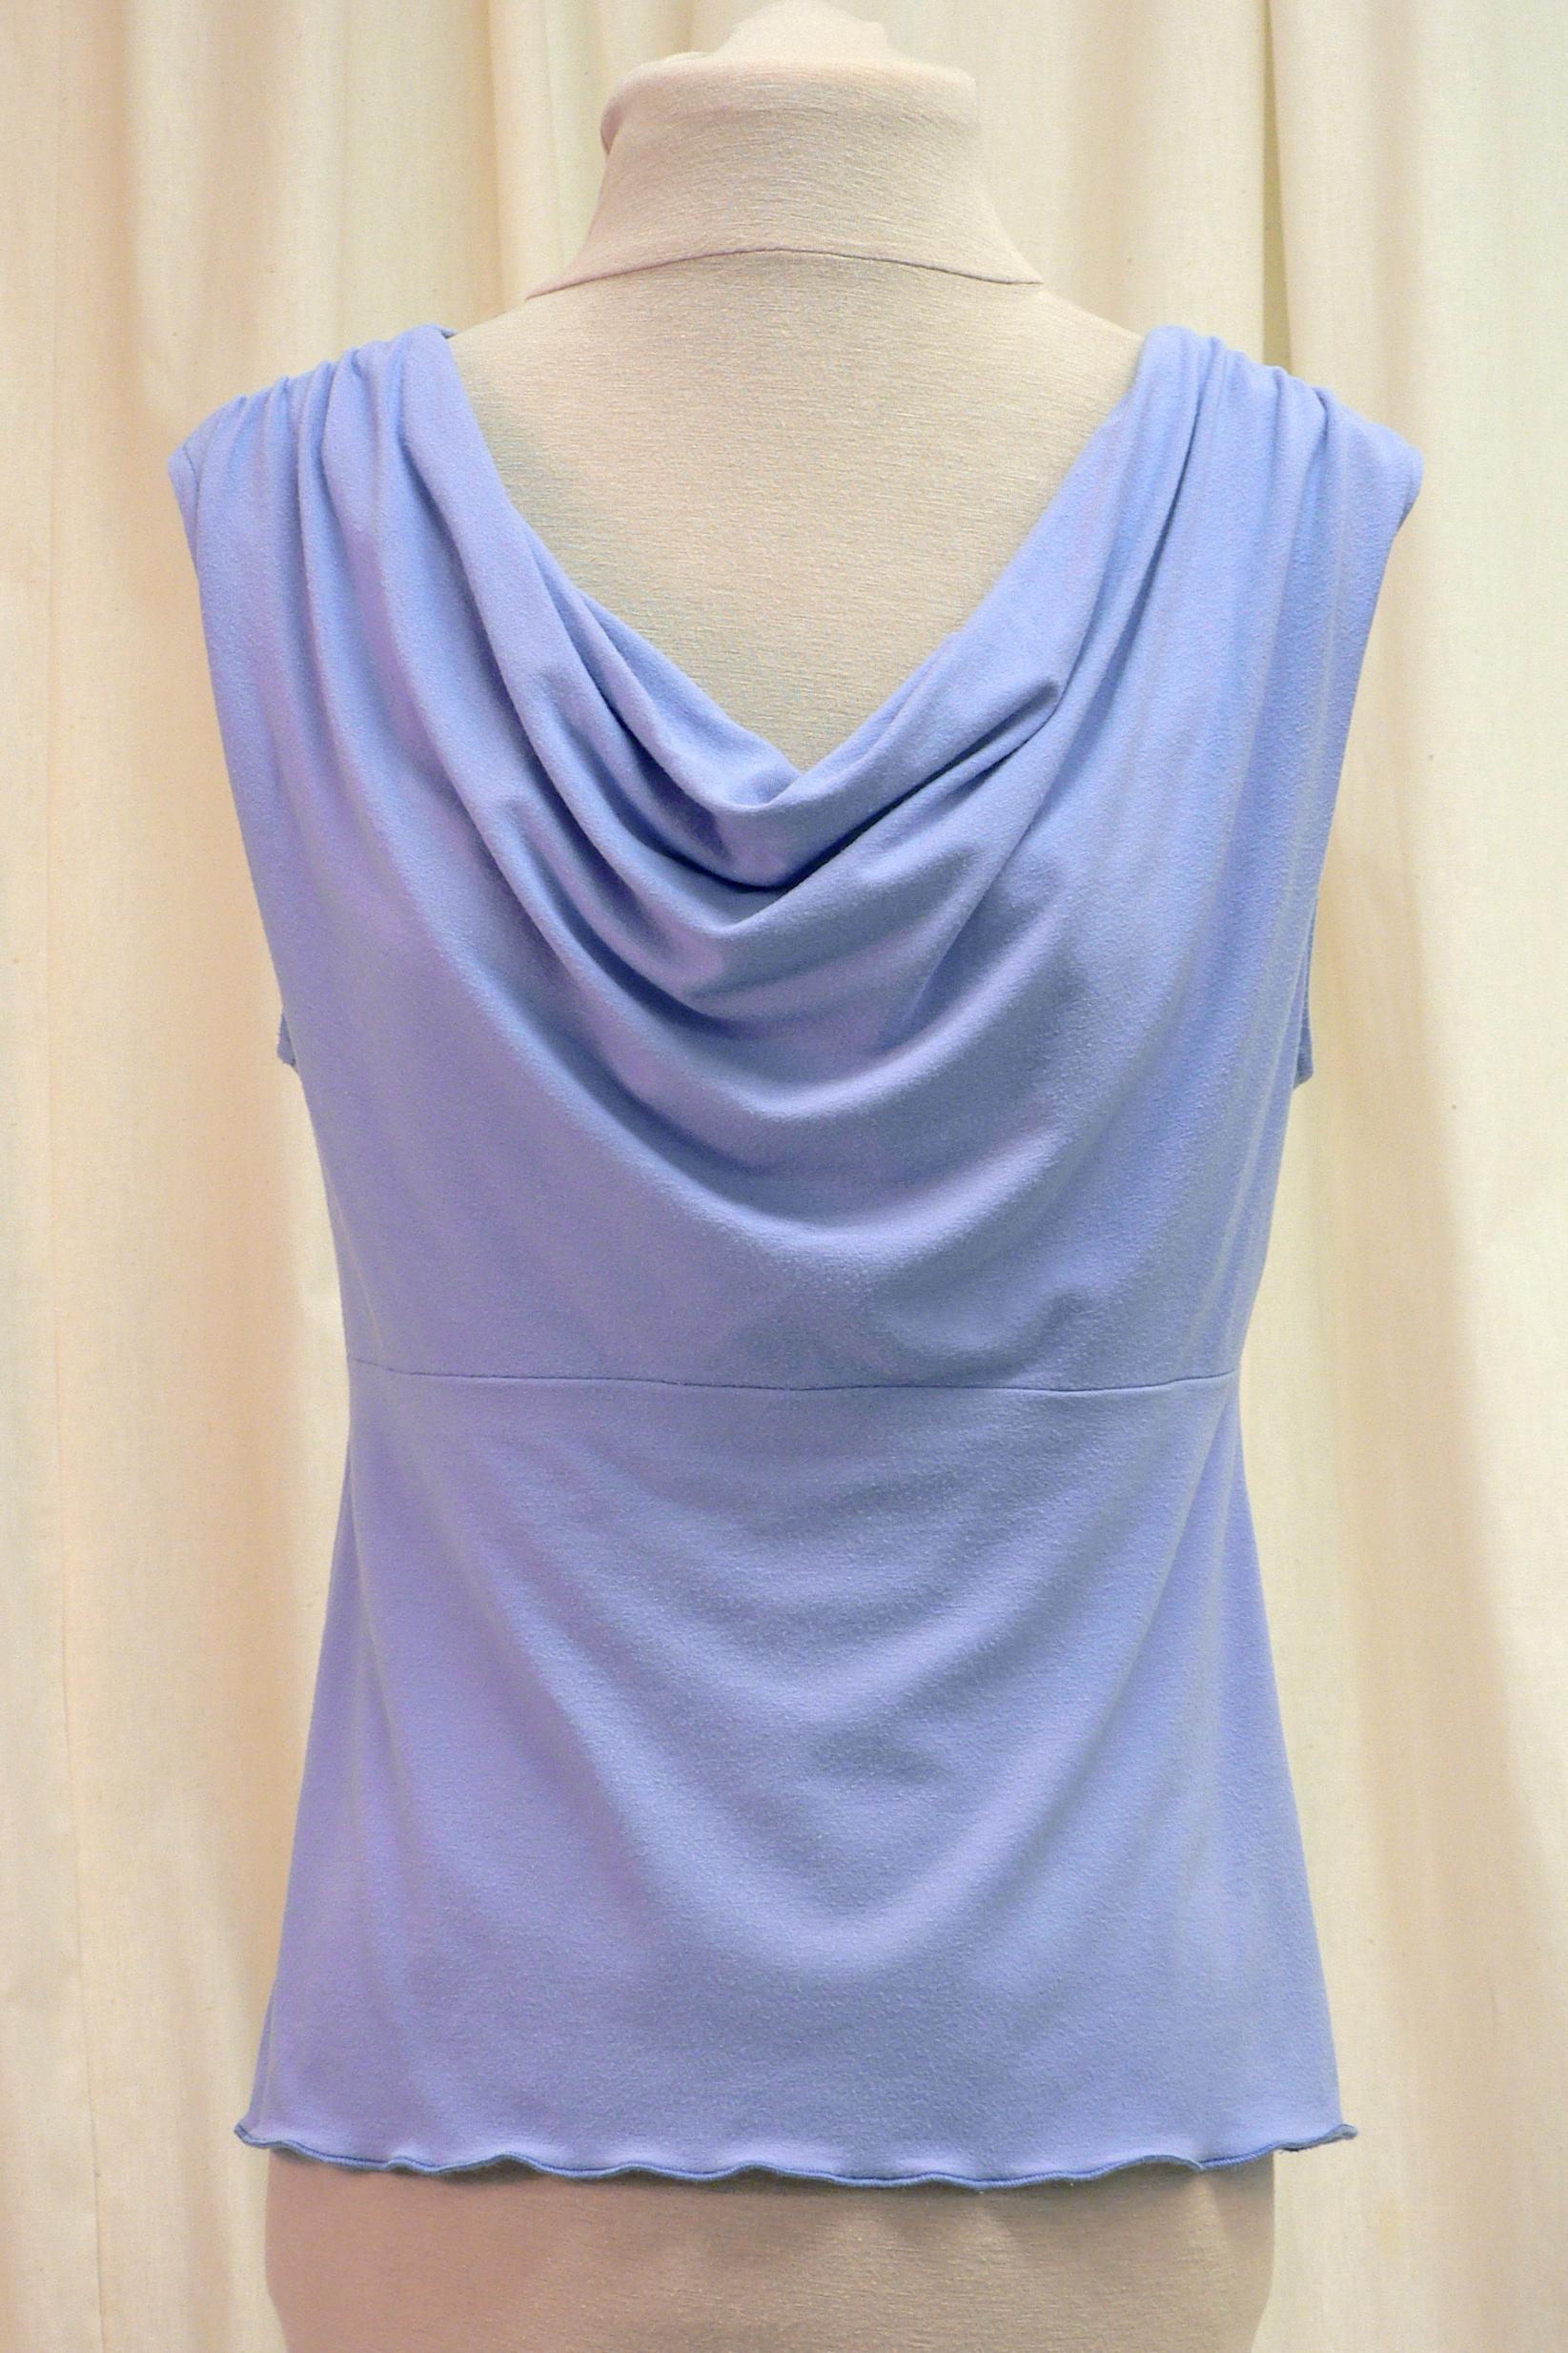 blouse09_front.jpg